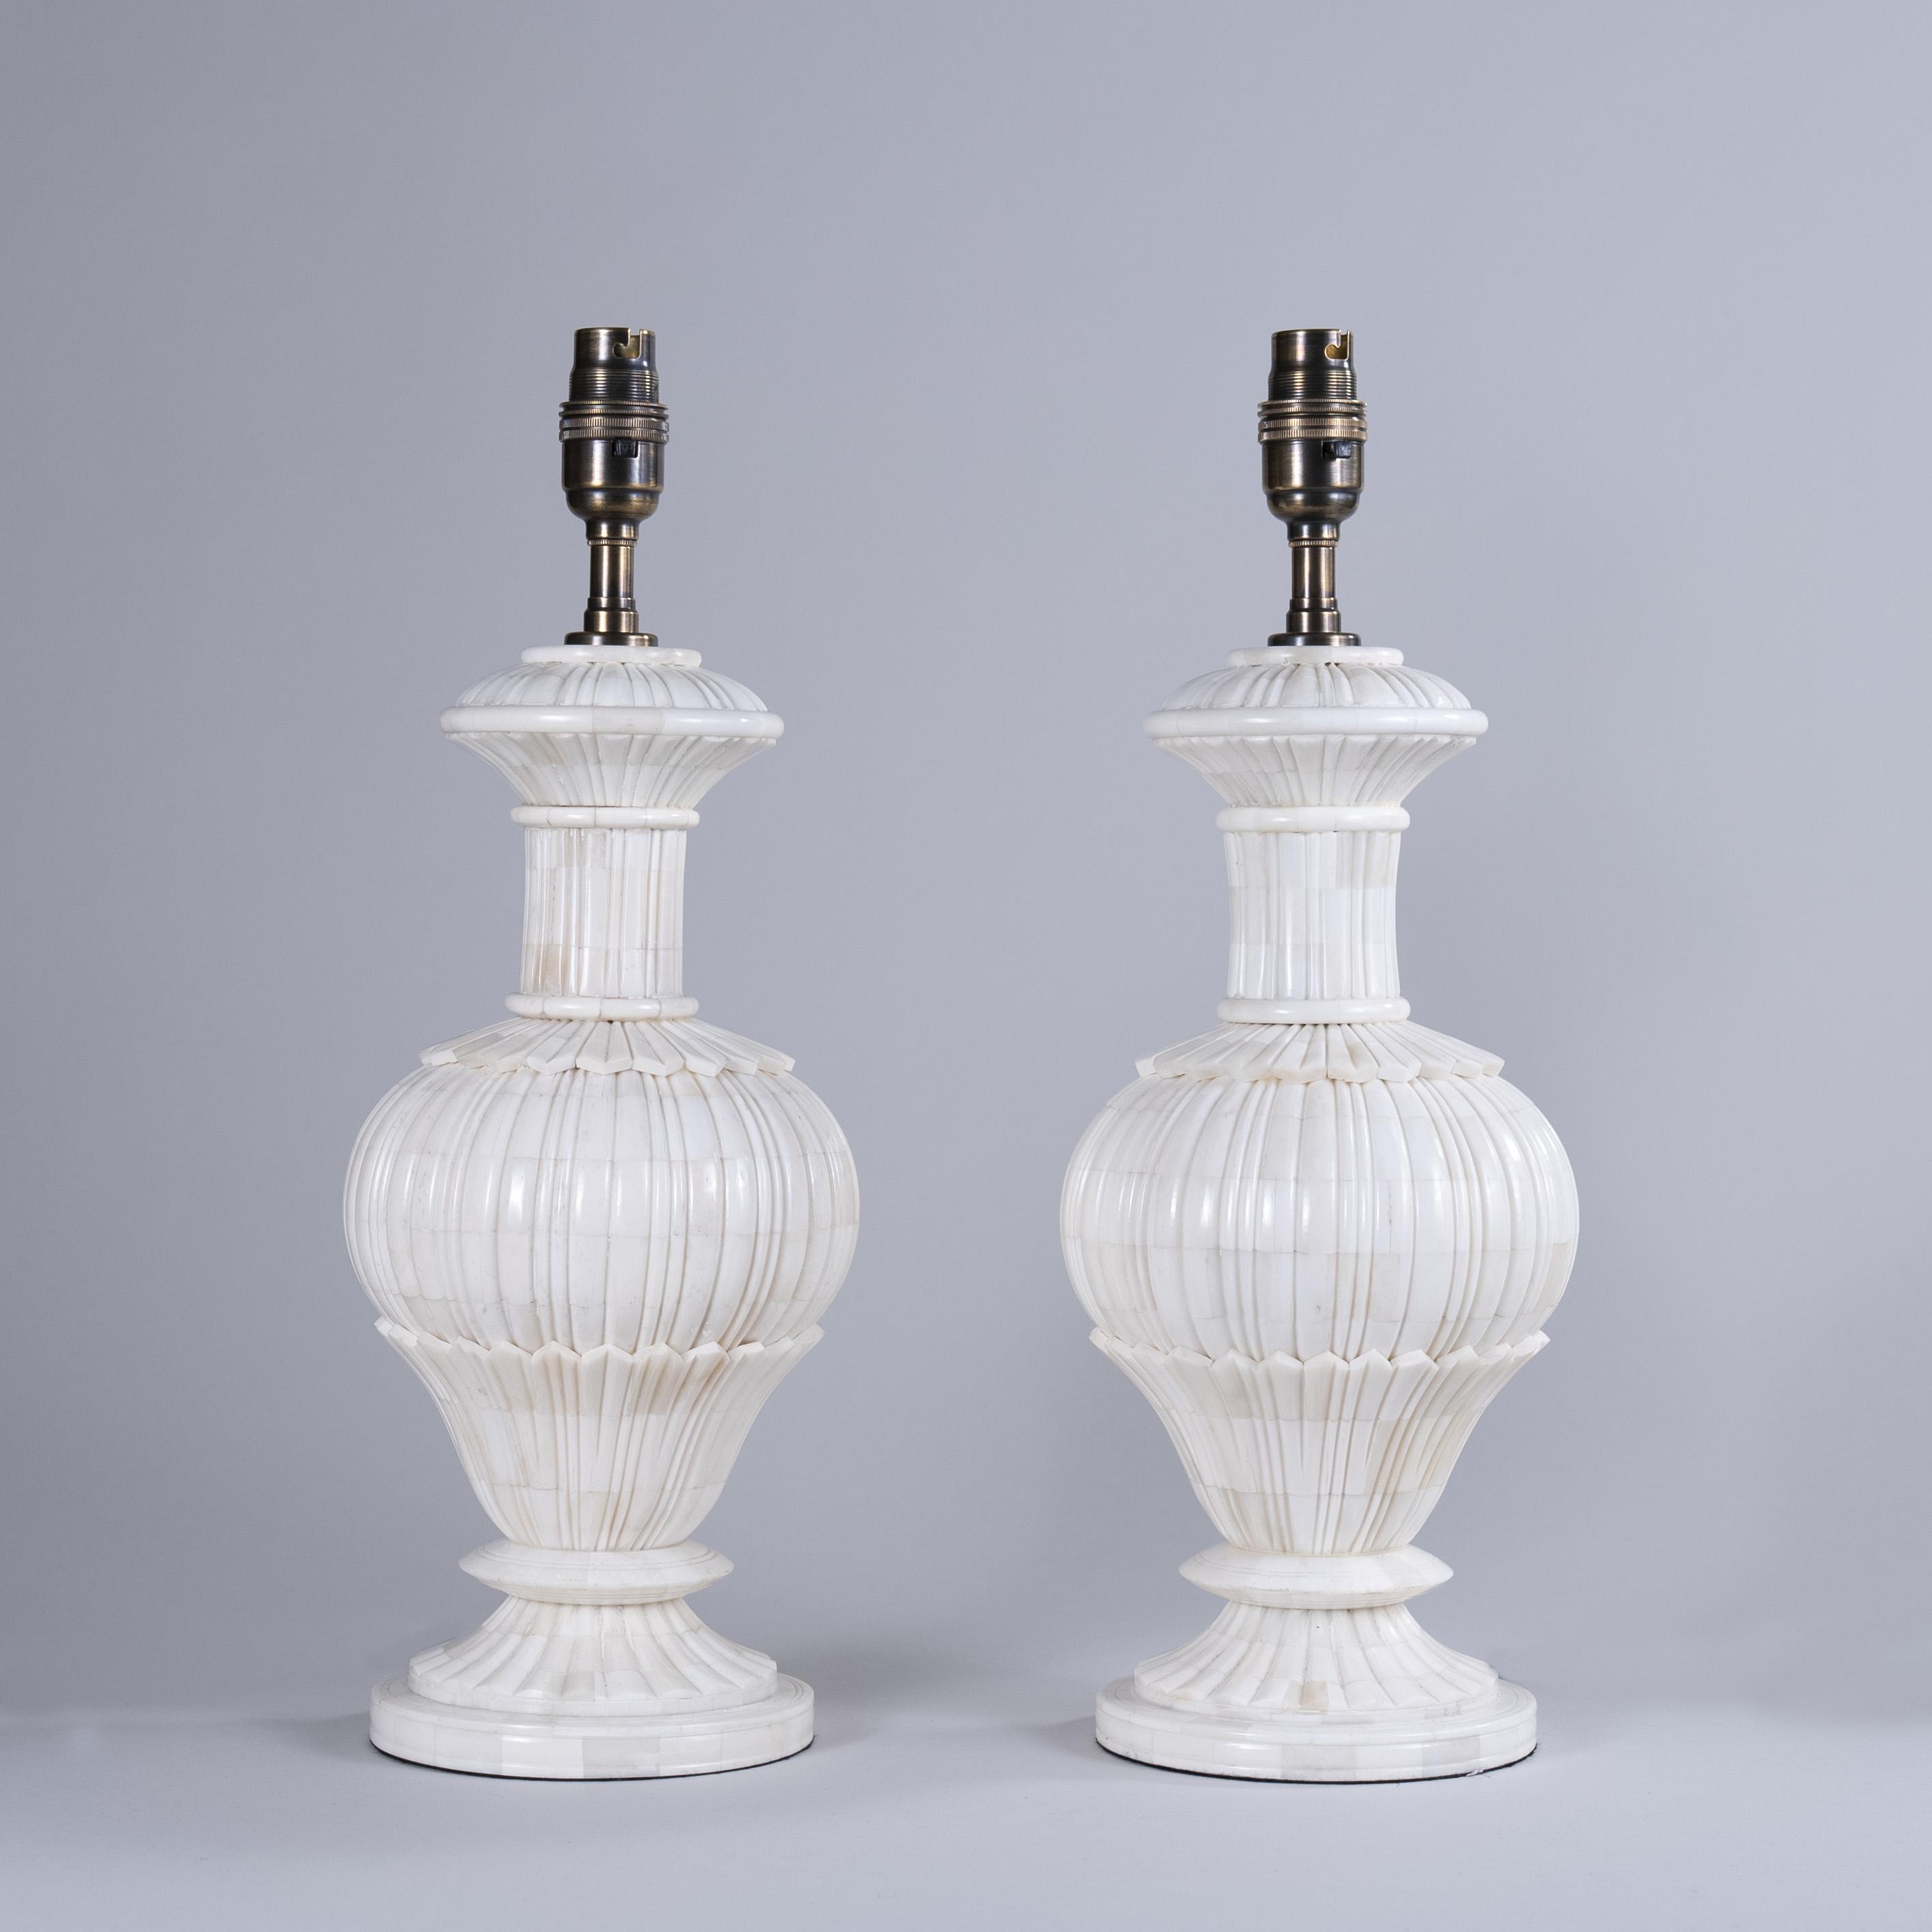 Pair of Mid 19th Century Indian Mughal Bone Veneered Lamps